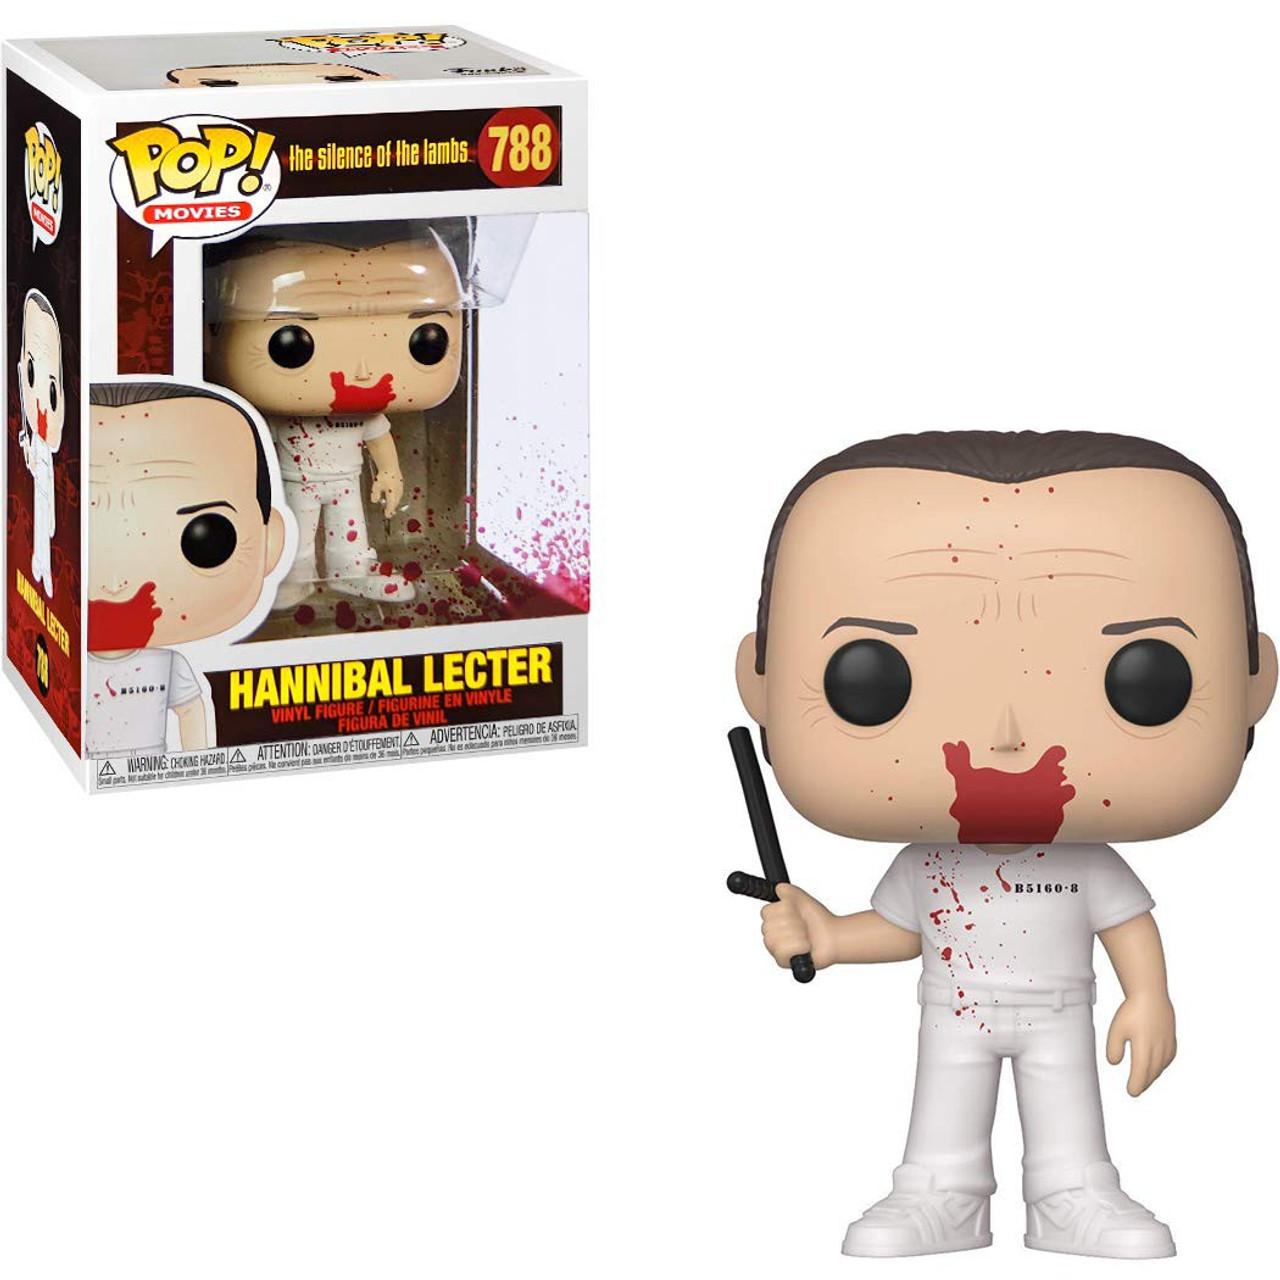 Silence of Lambs Bloody Hannibal Lecter Pop Vinyl Figure Funko   In Stock!